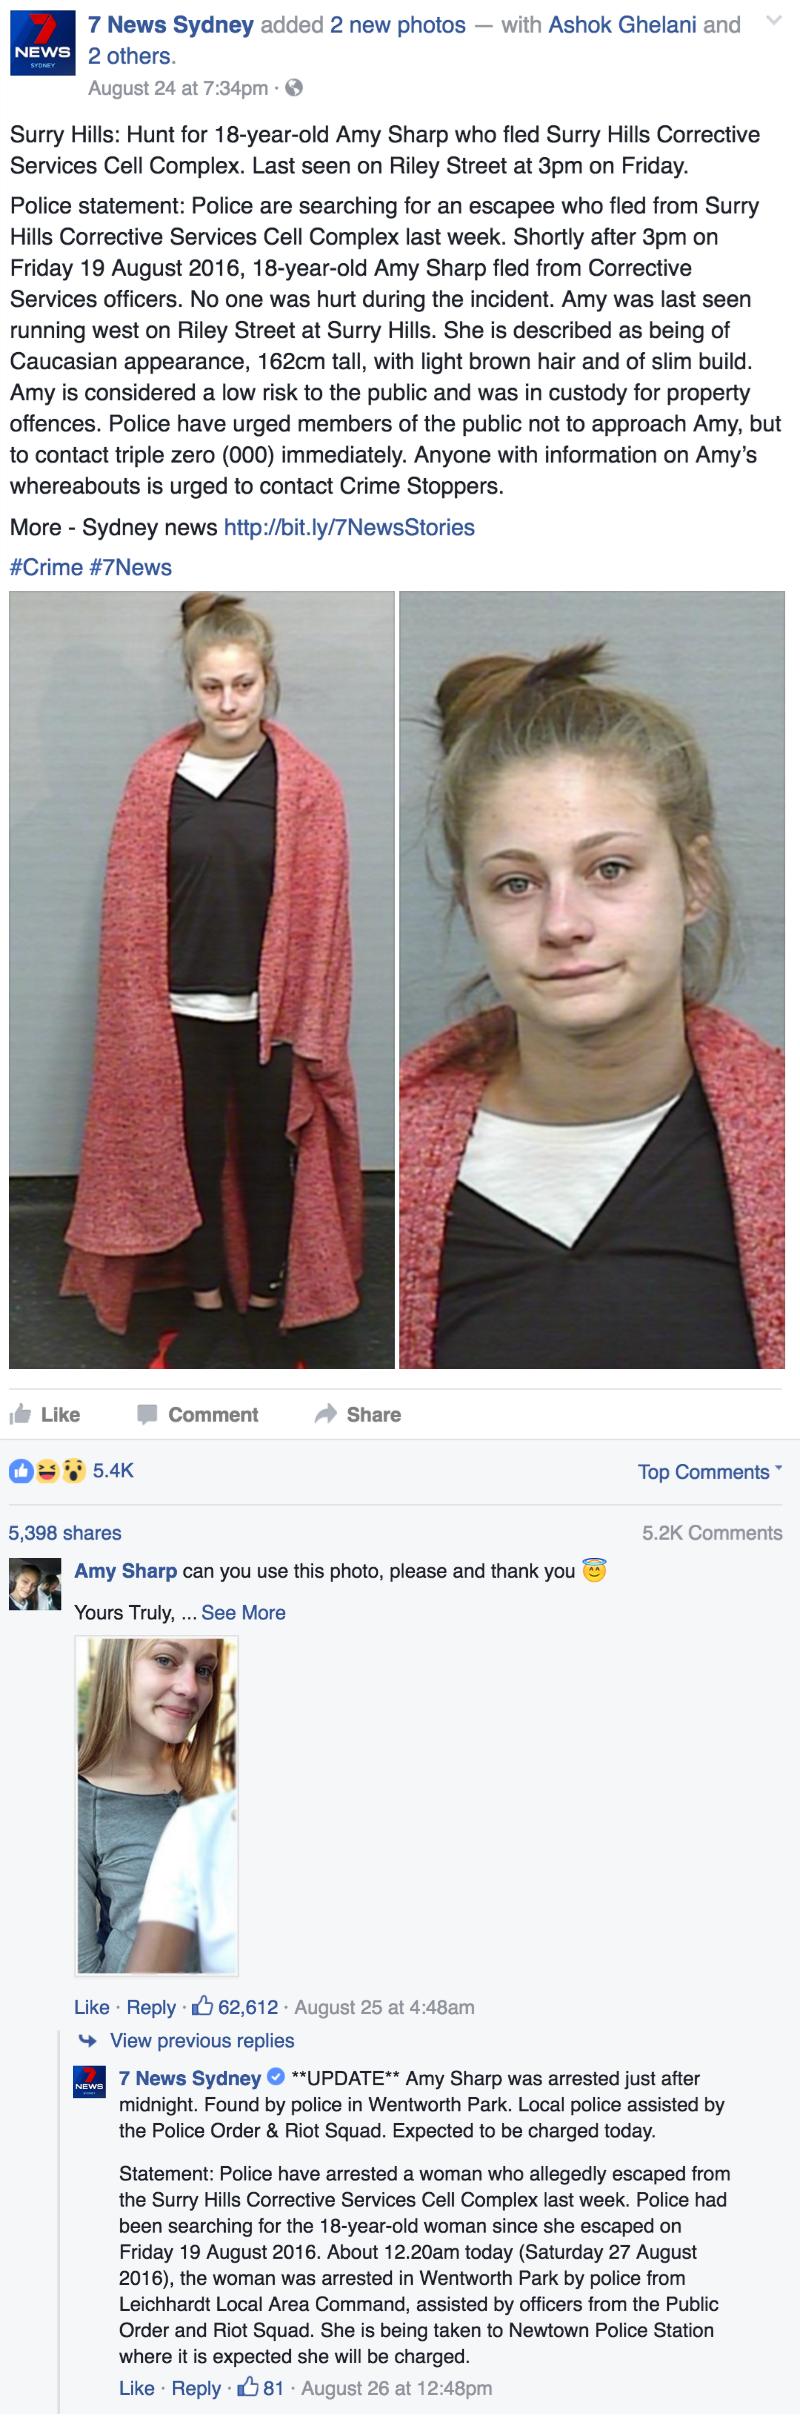 funny fail image Australian fugitive gets caught after asking for a better mugshot on facebook